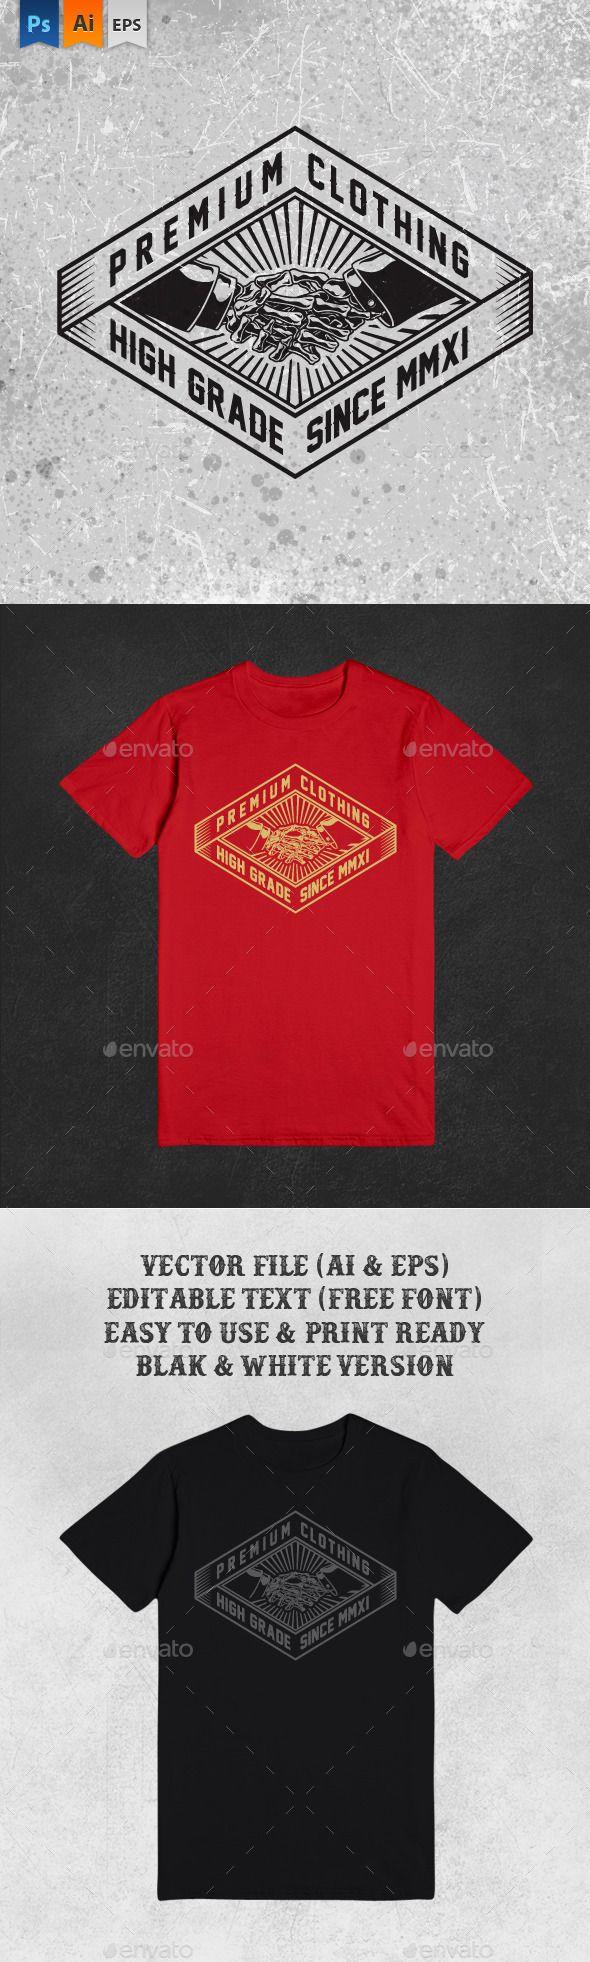 Design t shirts software download free - Devil Pact Clean Designt Shirt